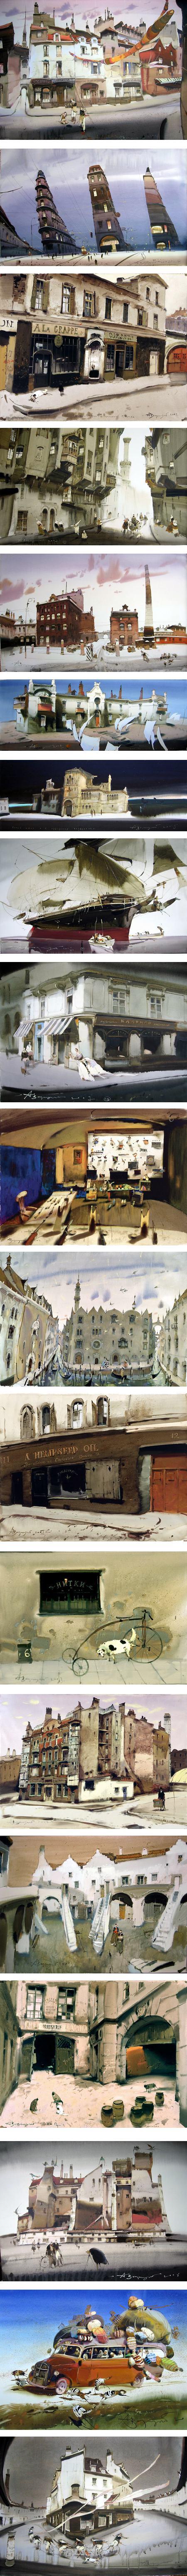 Alexander Votsmush (Shumtov), watercolors